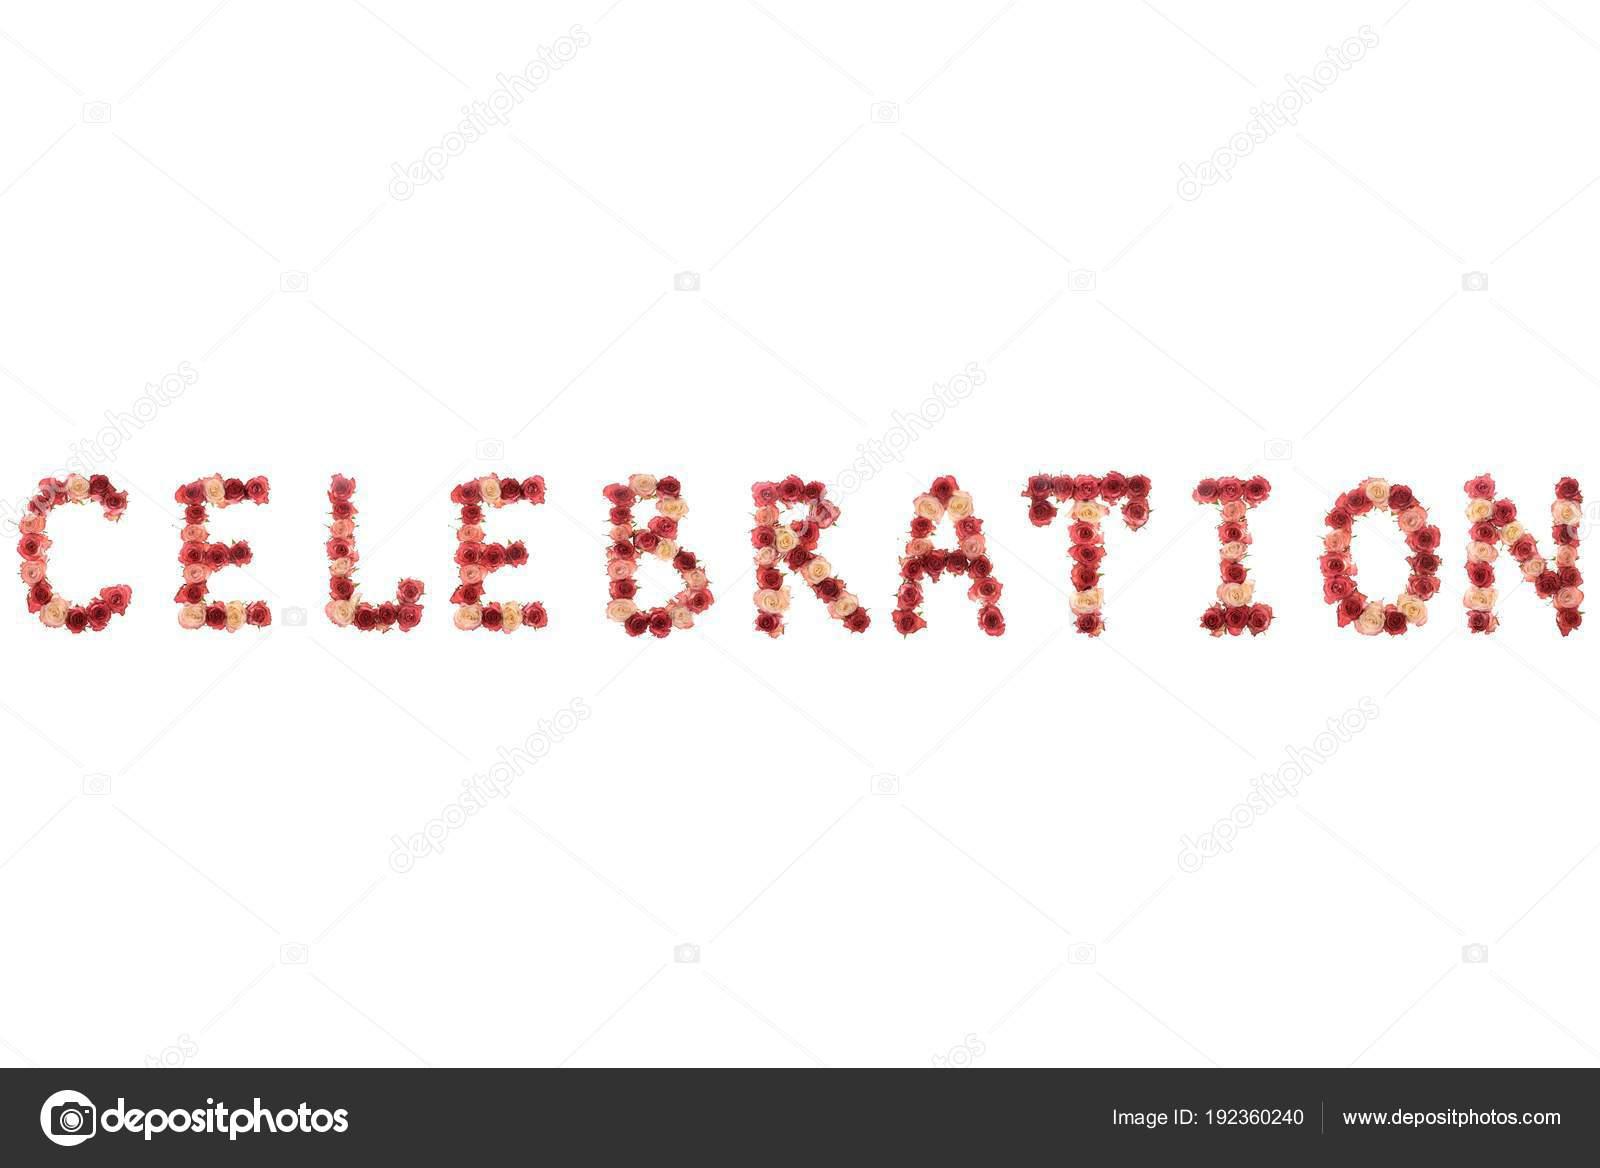 Celebration Letter | Word Celebration Letter Lined Fresh Natural Pink Roses Flowers White